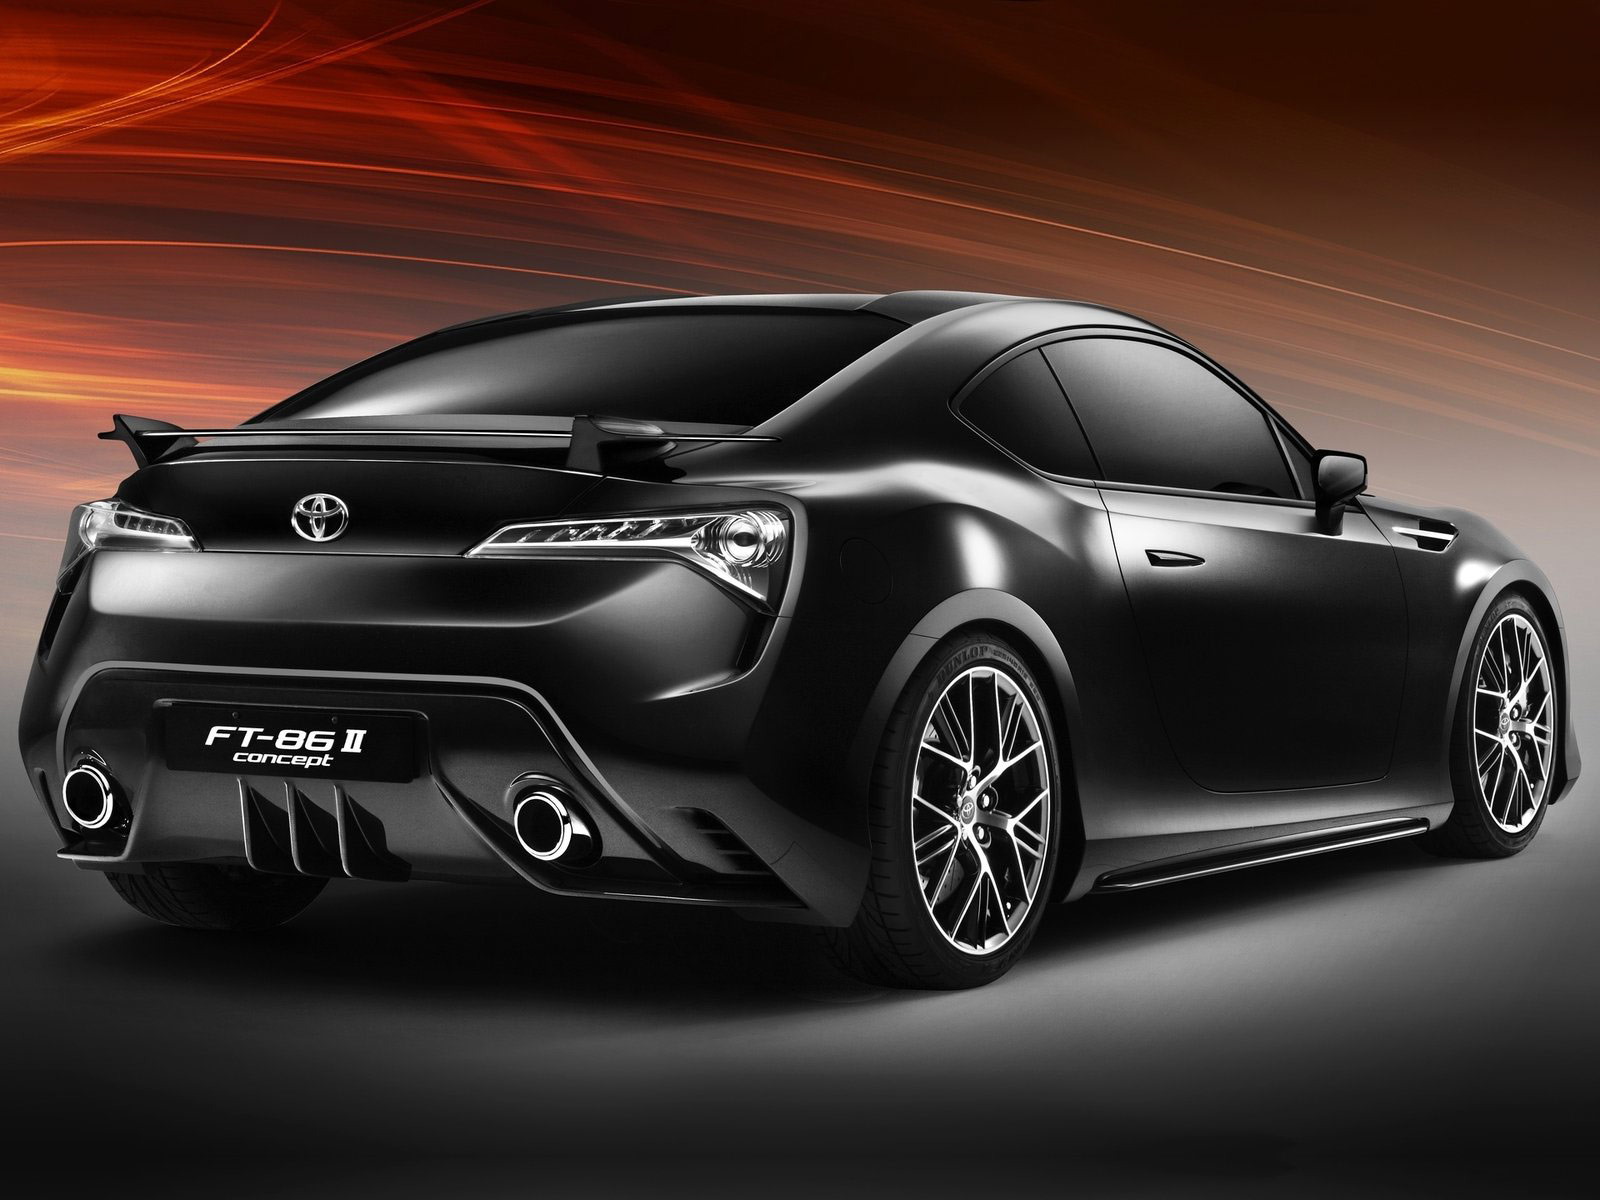 2011 Toyota FT-86 II Concept | Japanese car photos